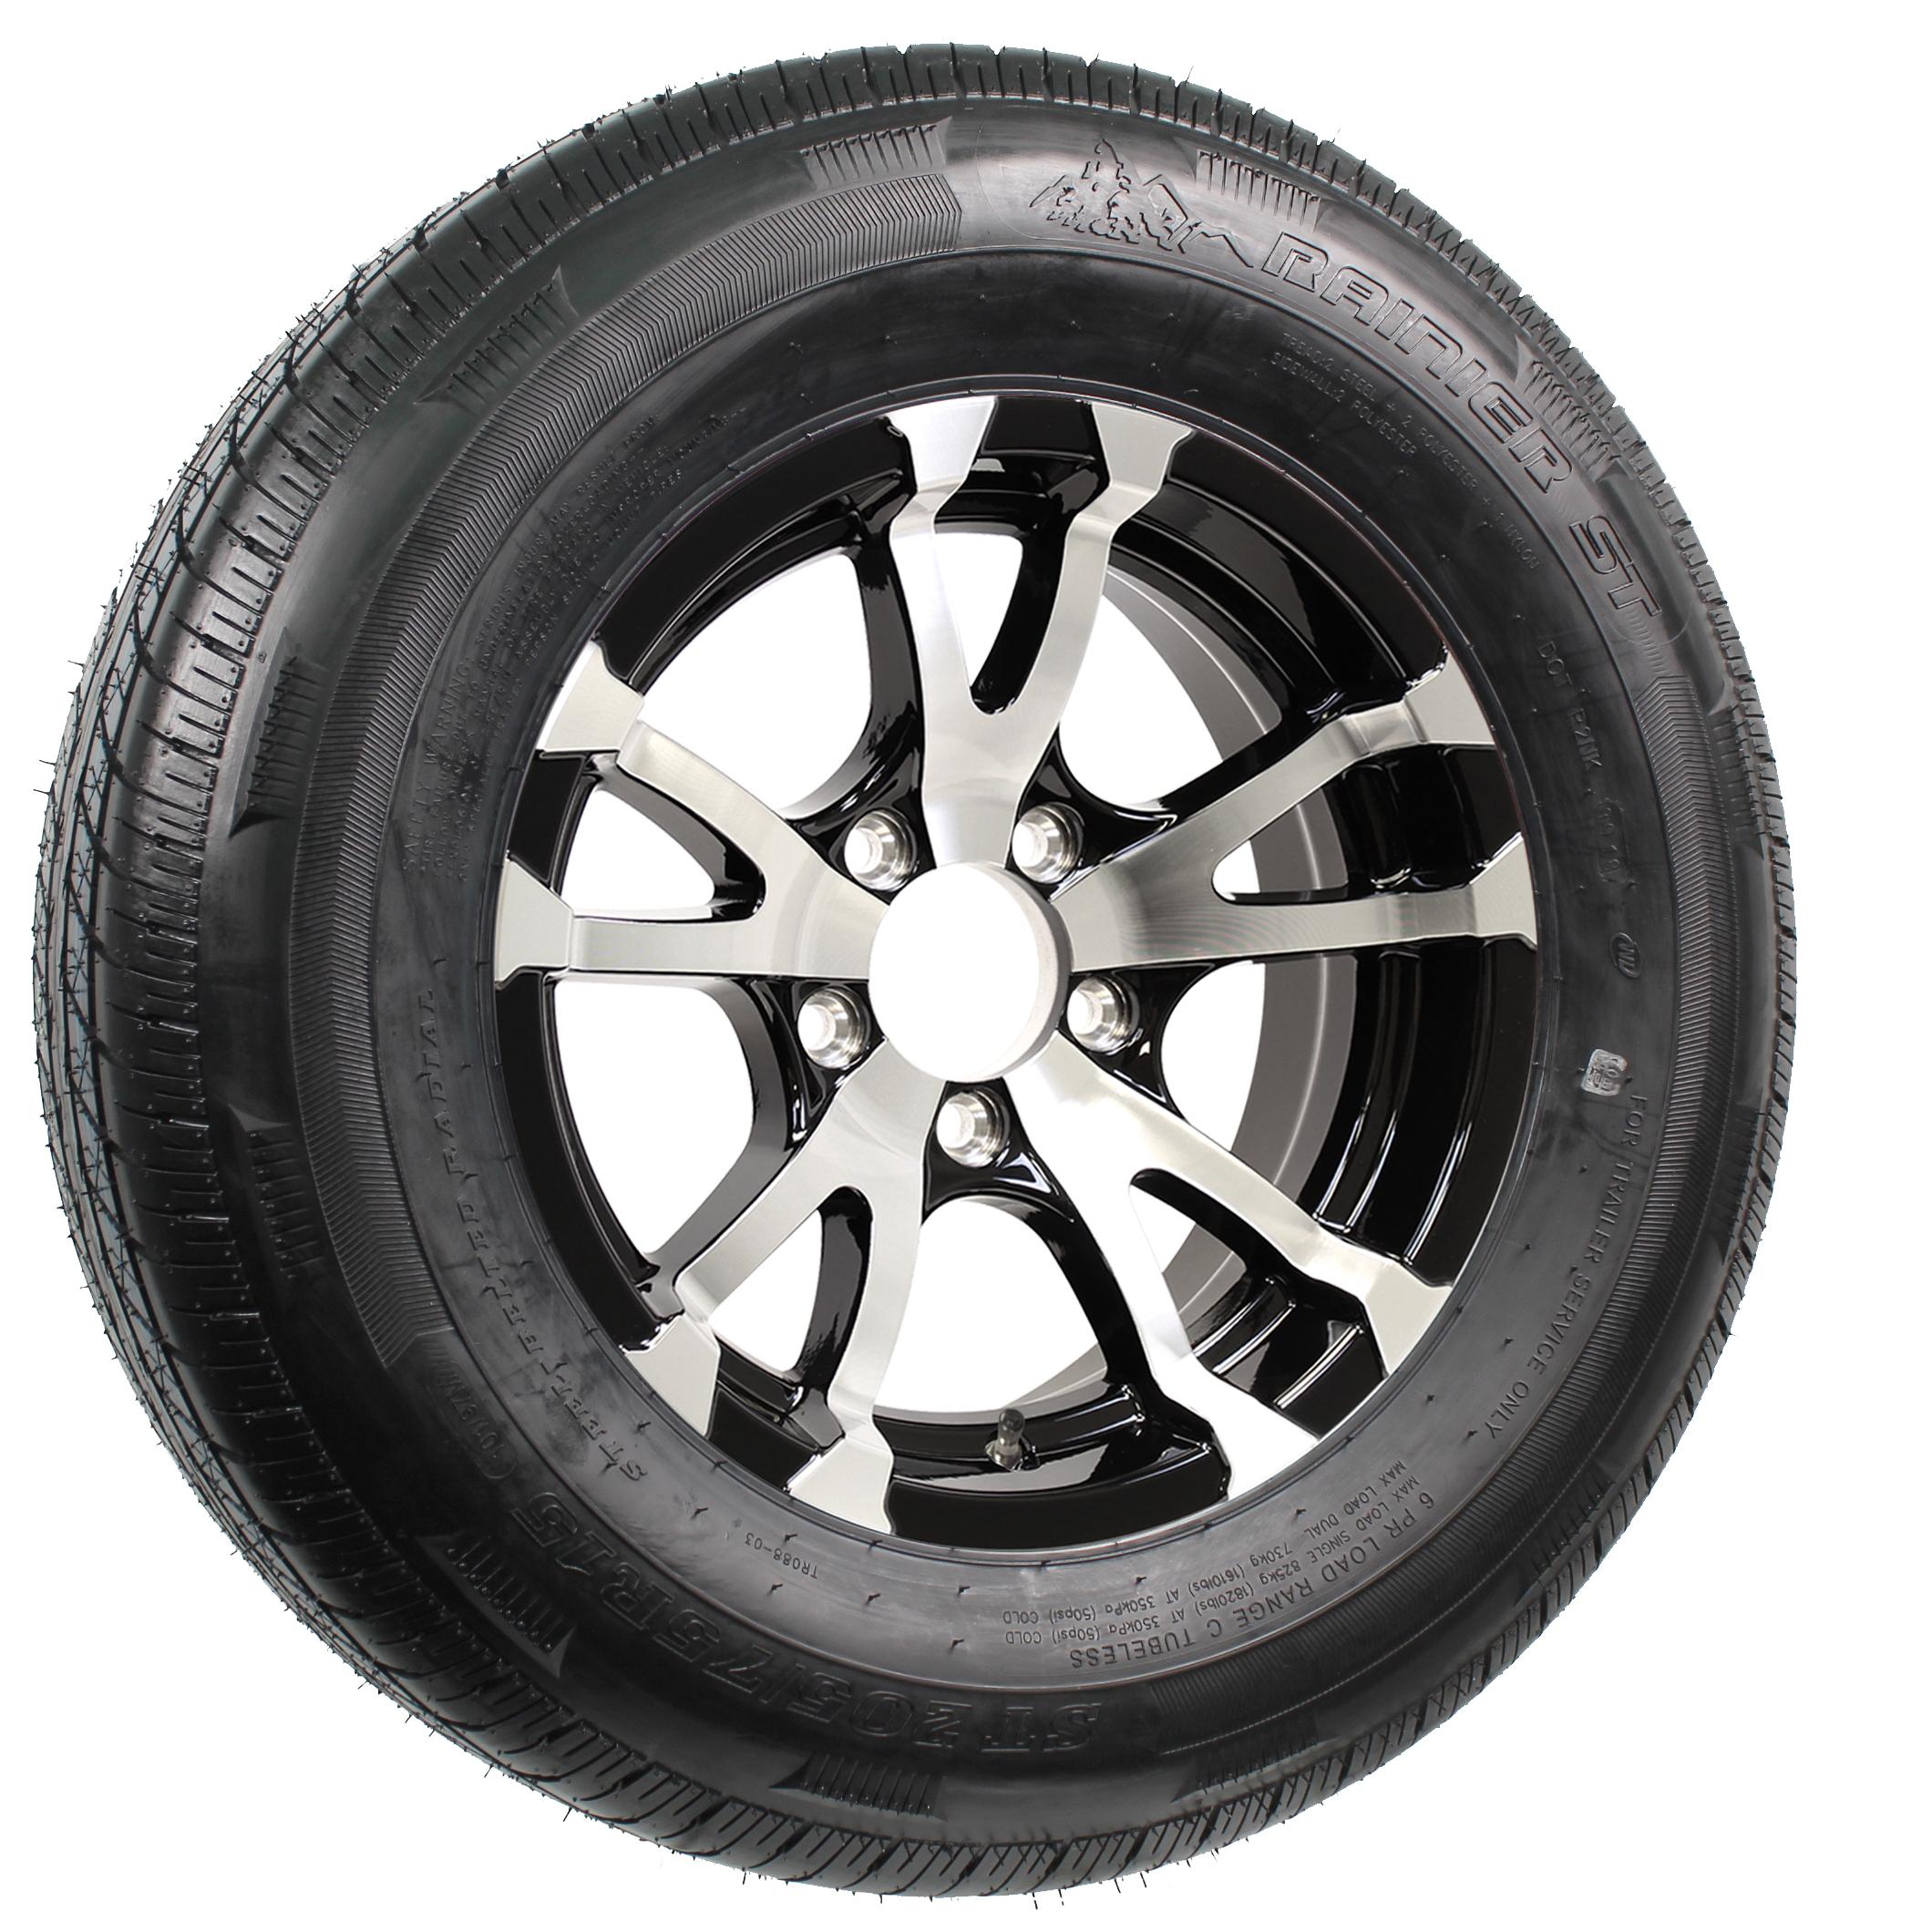 "Rainier ST205/75R15 LRD Radial Tire on 15"" 5-Lug Avalanche Black Aluminum Assembly Image"